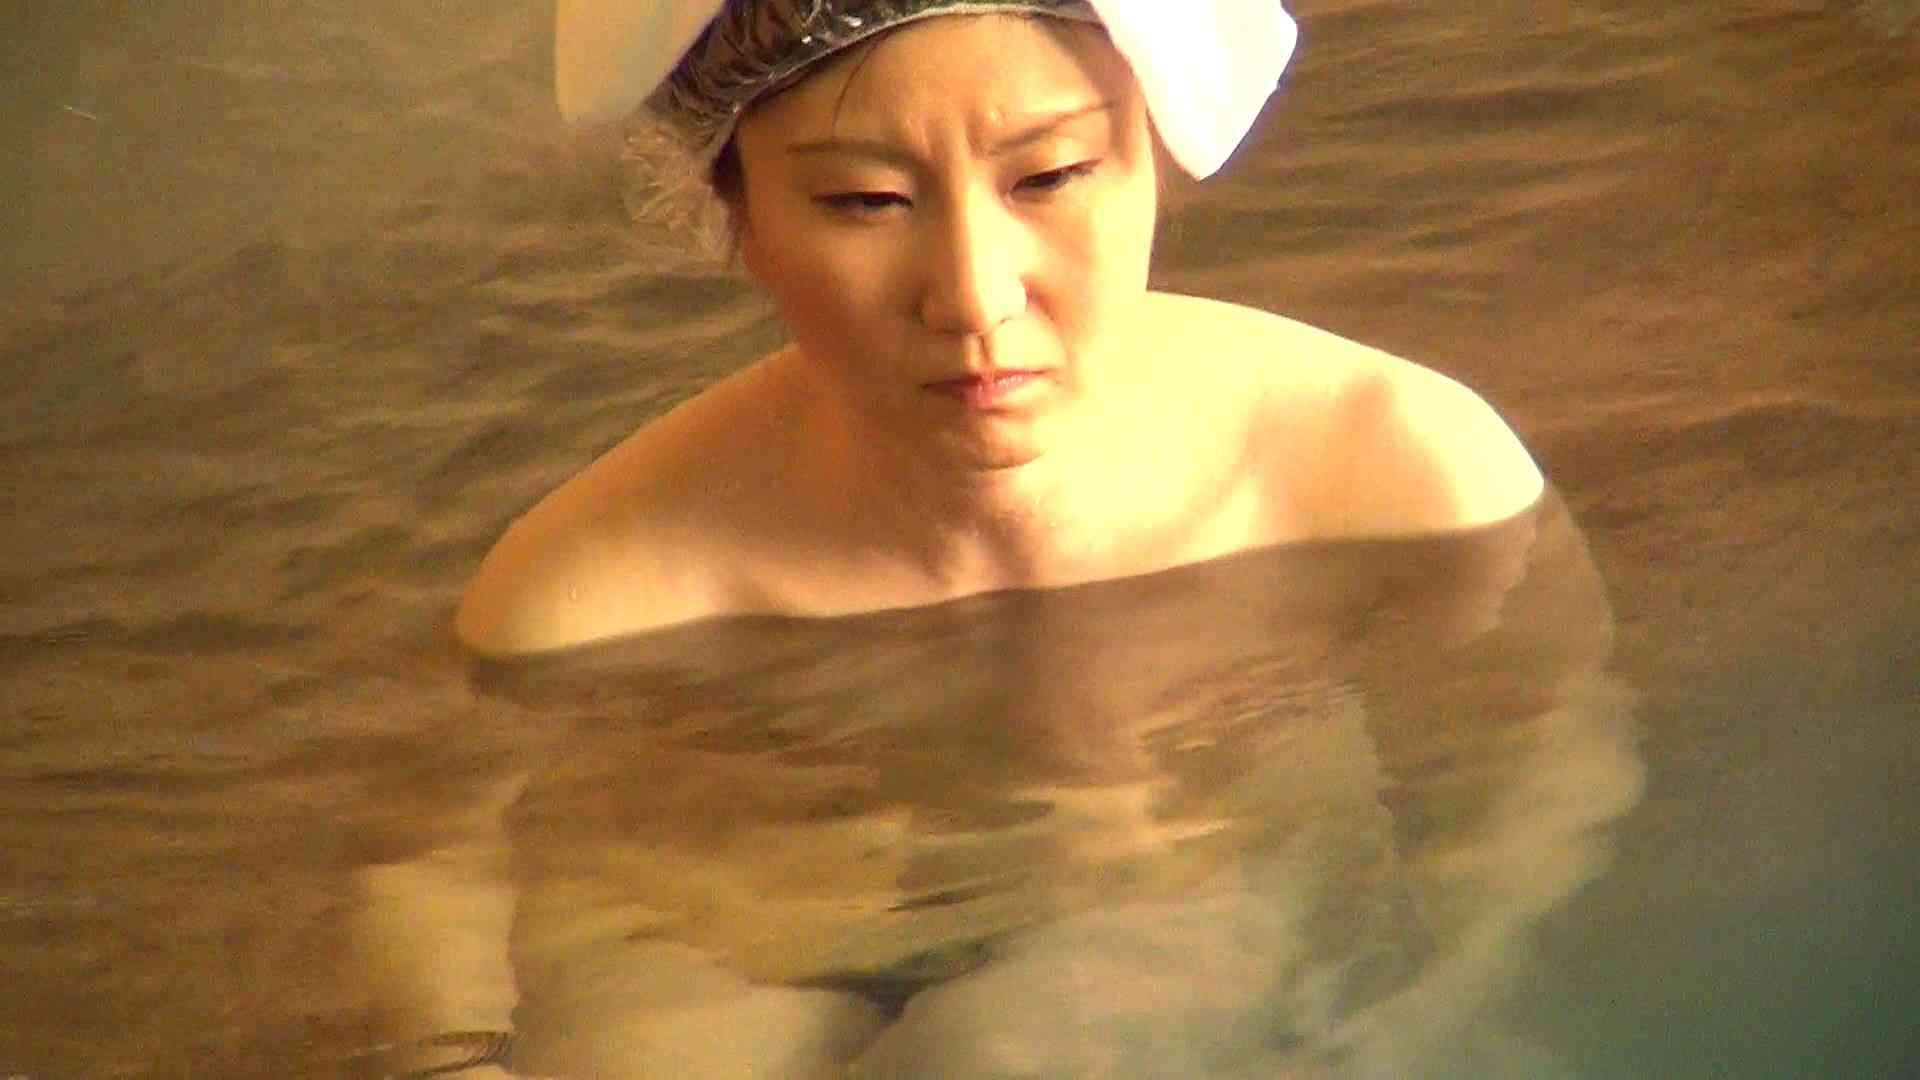 Aquaな露天風呂Vol.278 OLセックス 覗きオメコ動画キャプチャ 100画像 59